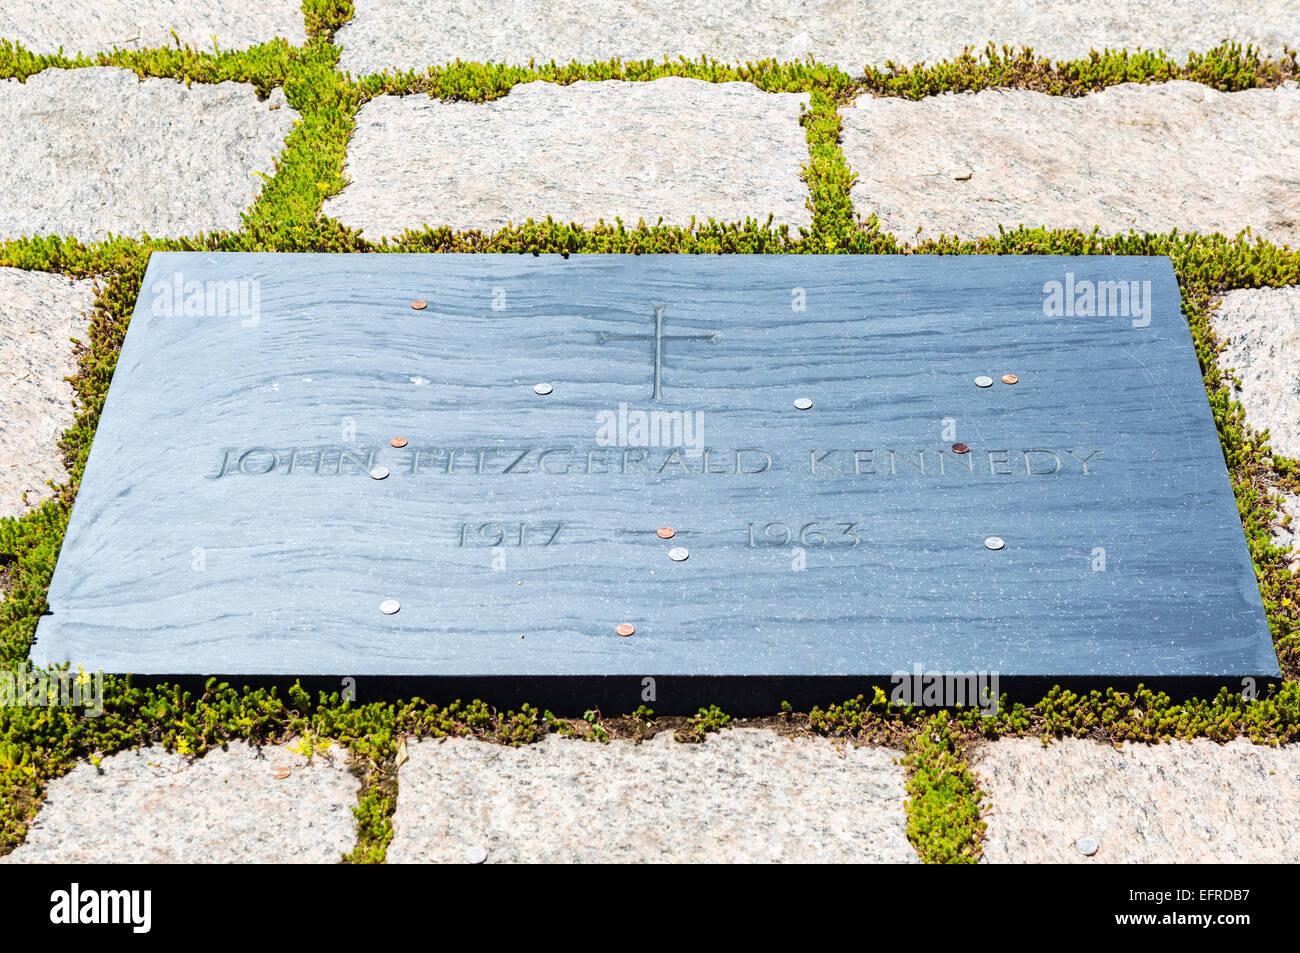 President John F Kennedy grave, Arlington National Cemetery, Arlington, Virginia, USA - Stock Image